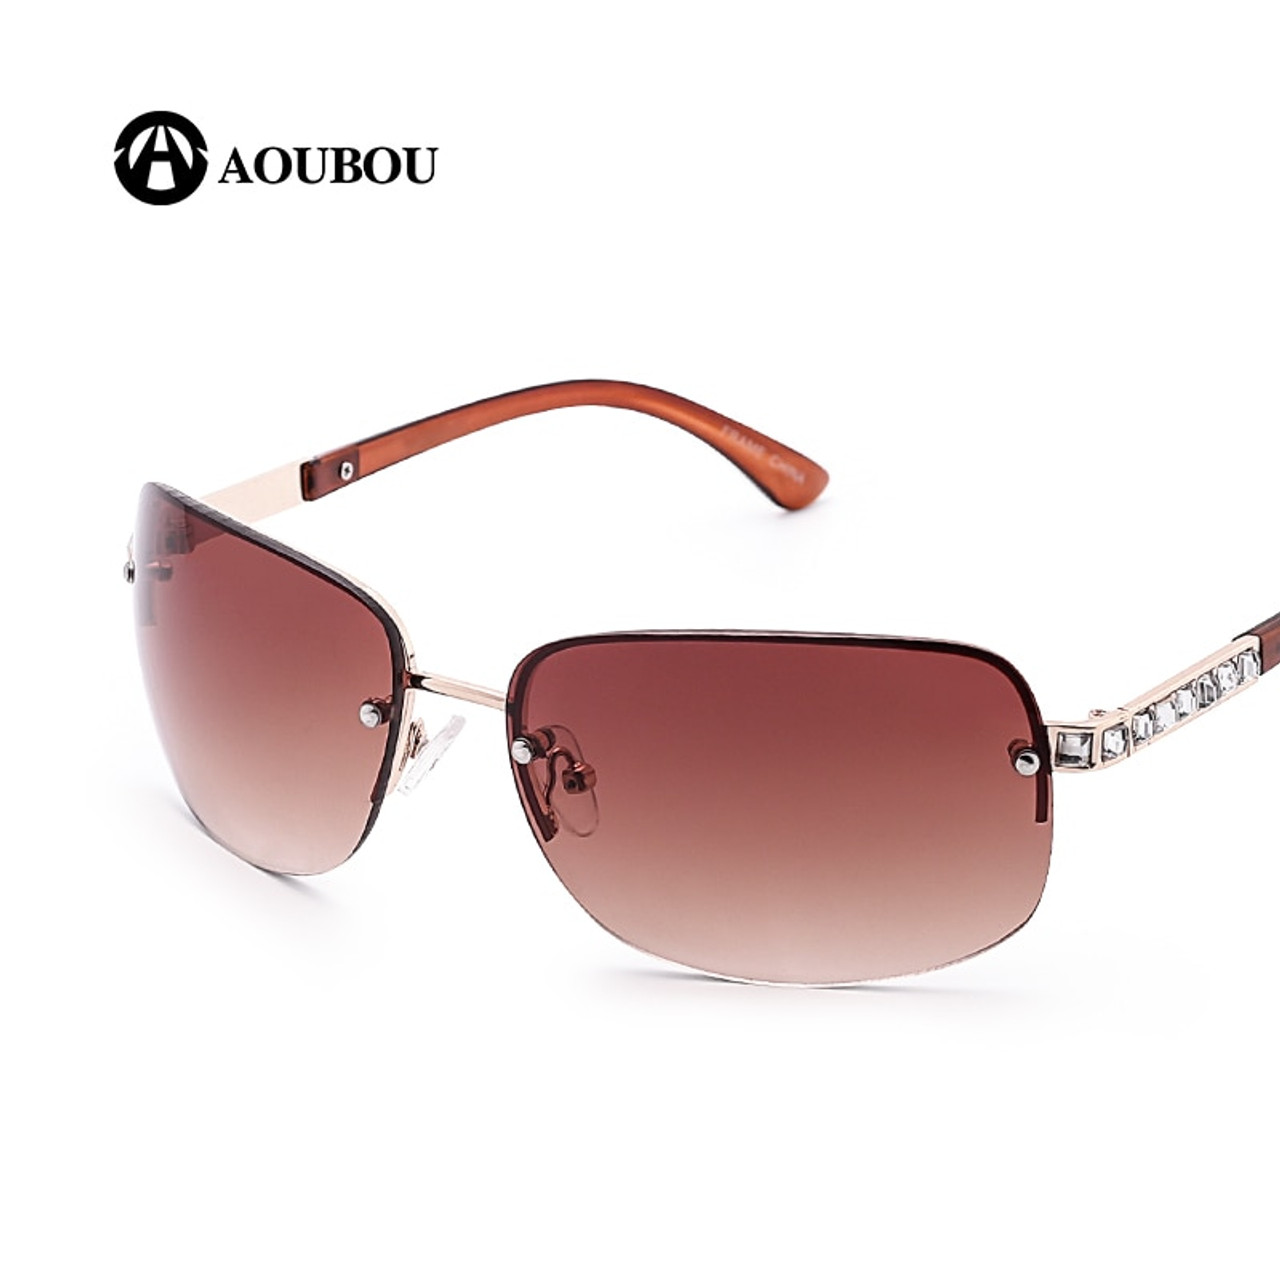 ba64650dbca ... AOUBOU Brand Designer Luxury Diamond Square Frame Sunglasses Women  Transparent Mercury Len Vintage White Sunglasses UV400 ...